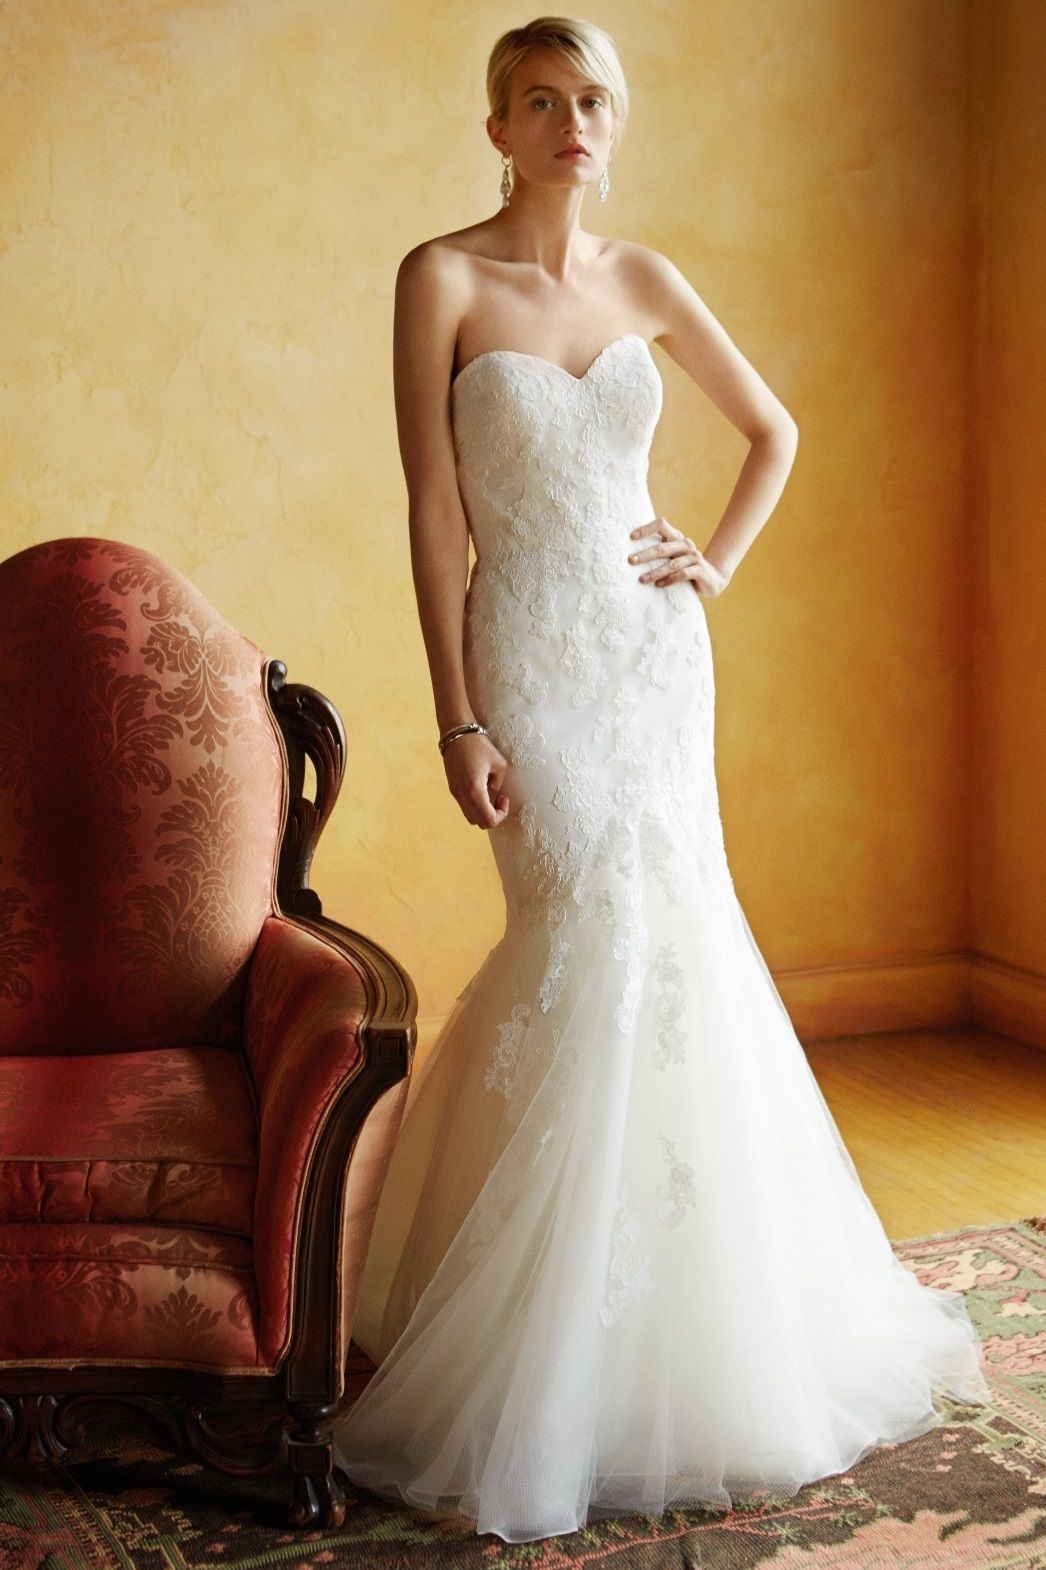 BT16-18 at Sposabella Bridal Gowns Durban. A gorgeous U-shaped ...